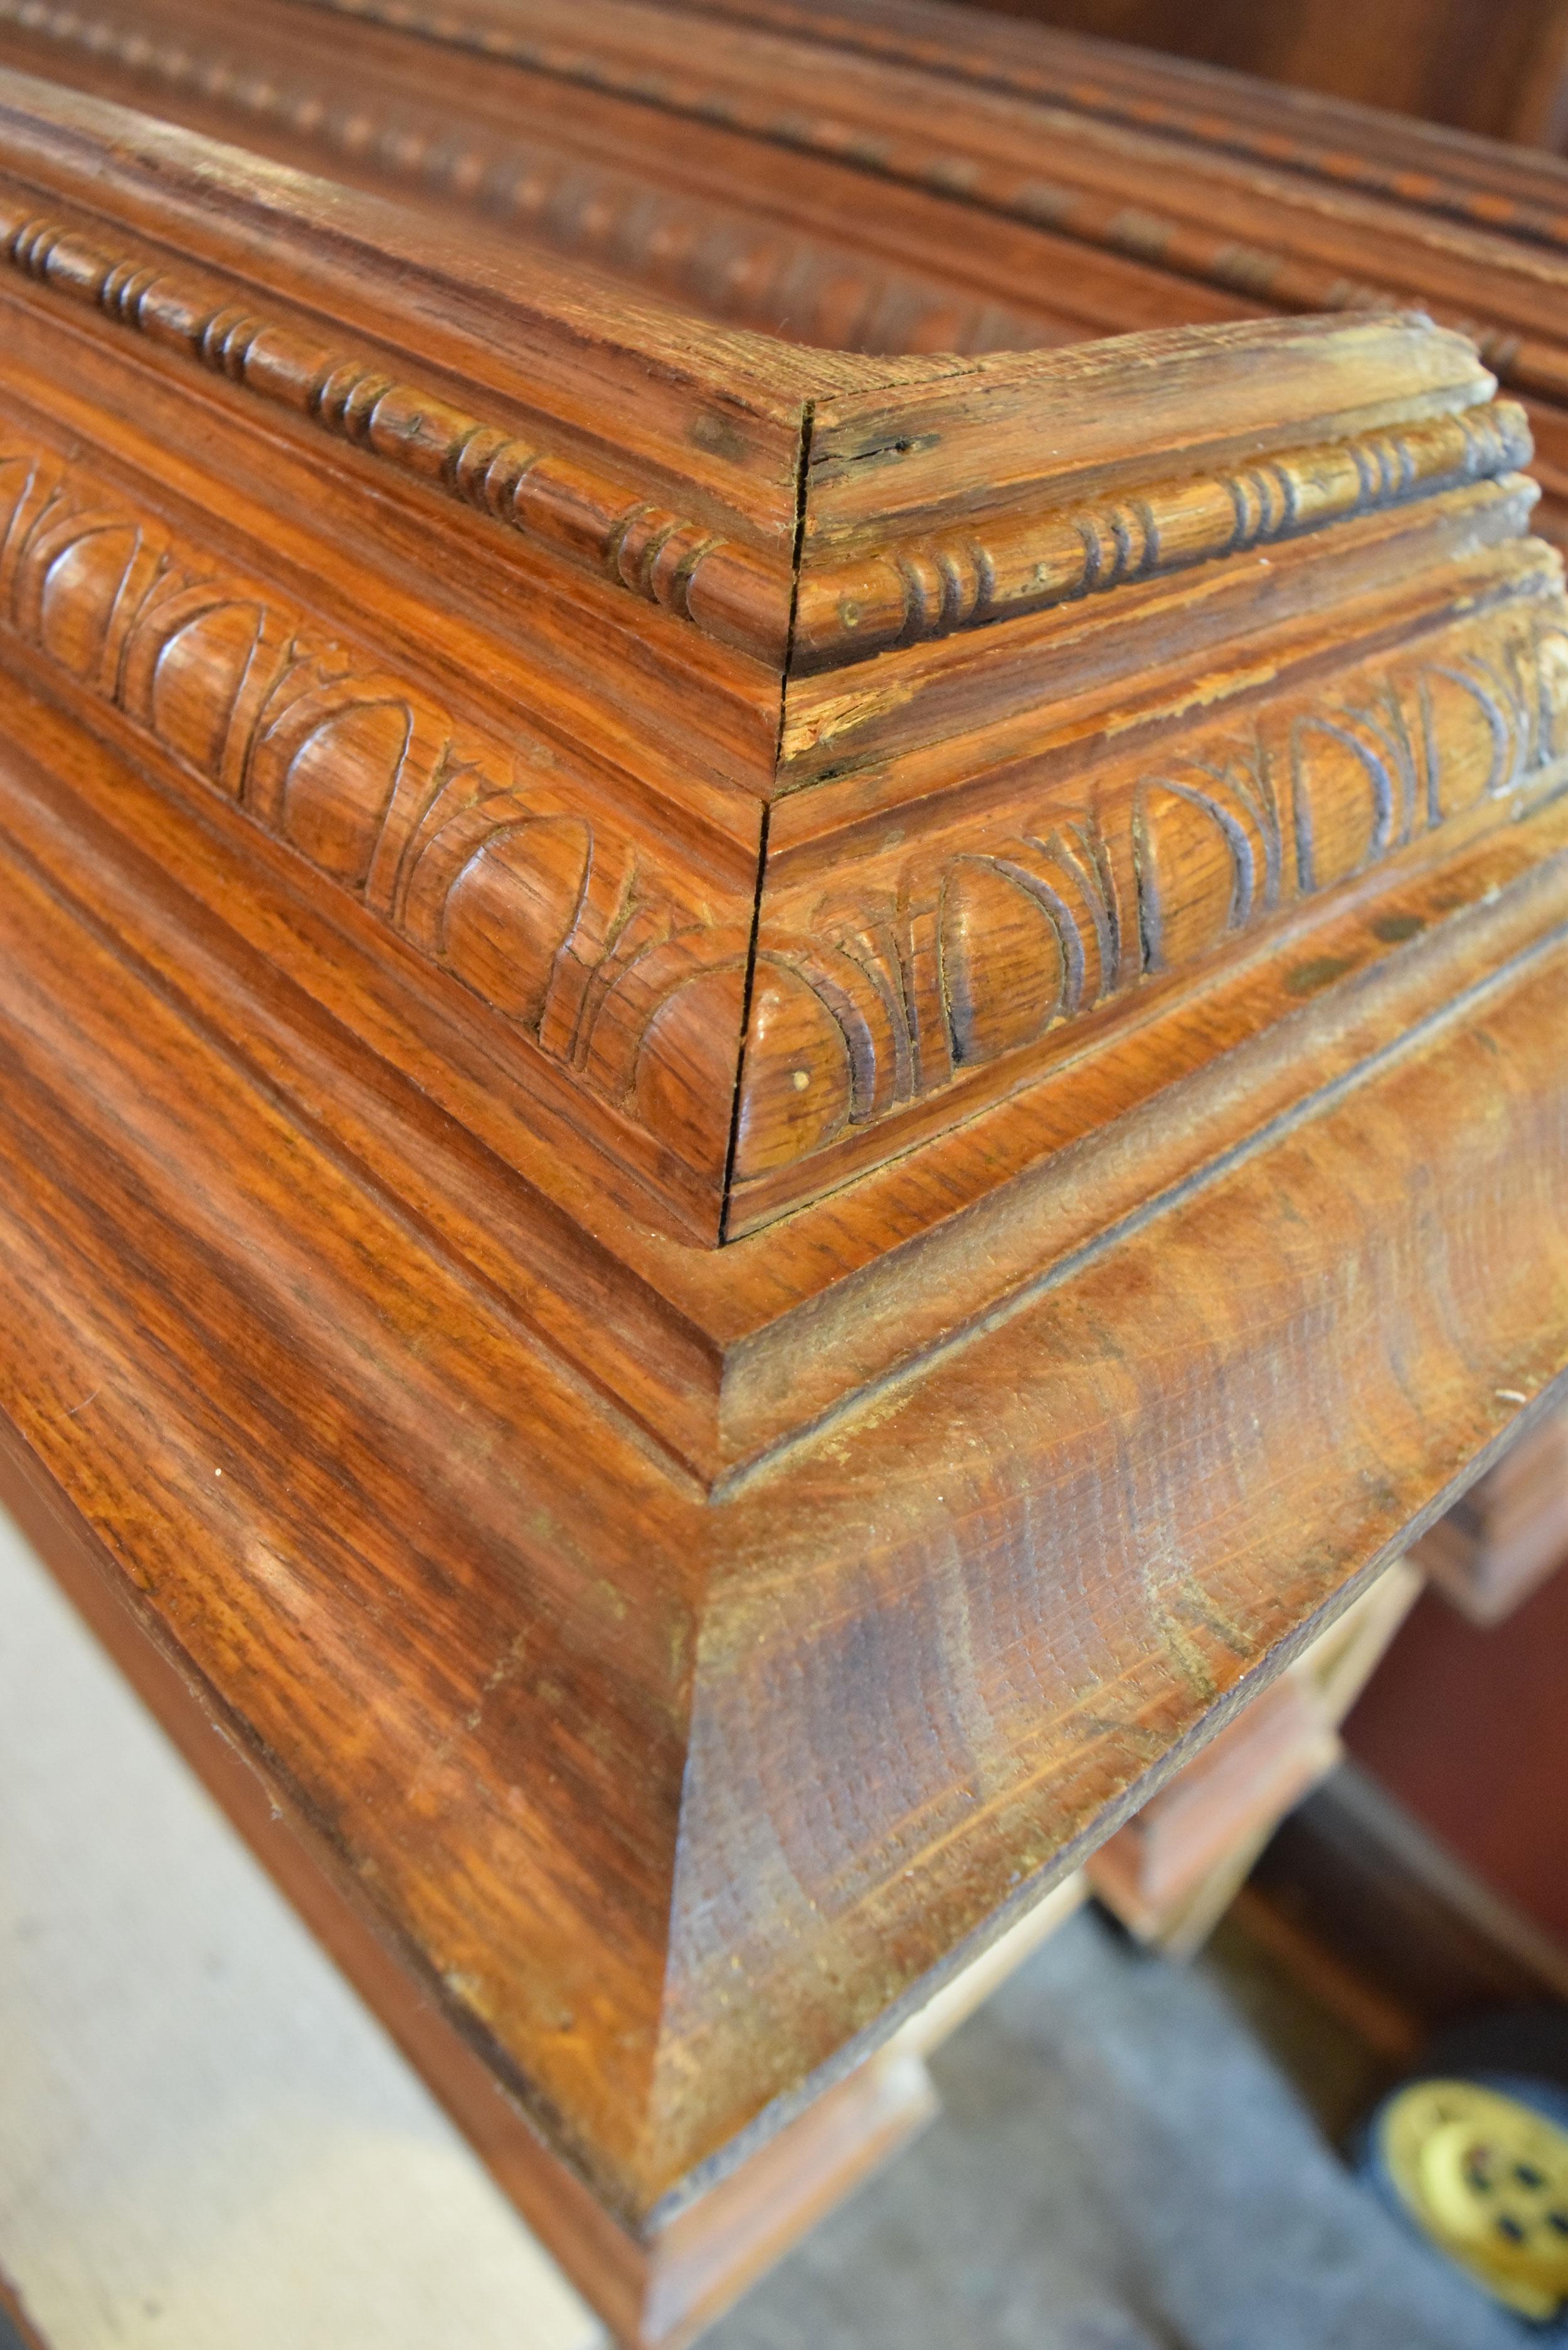 47048-quarter-sawn-oak-header-detail-3.jpg